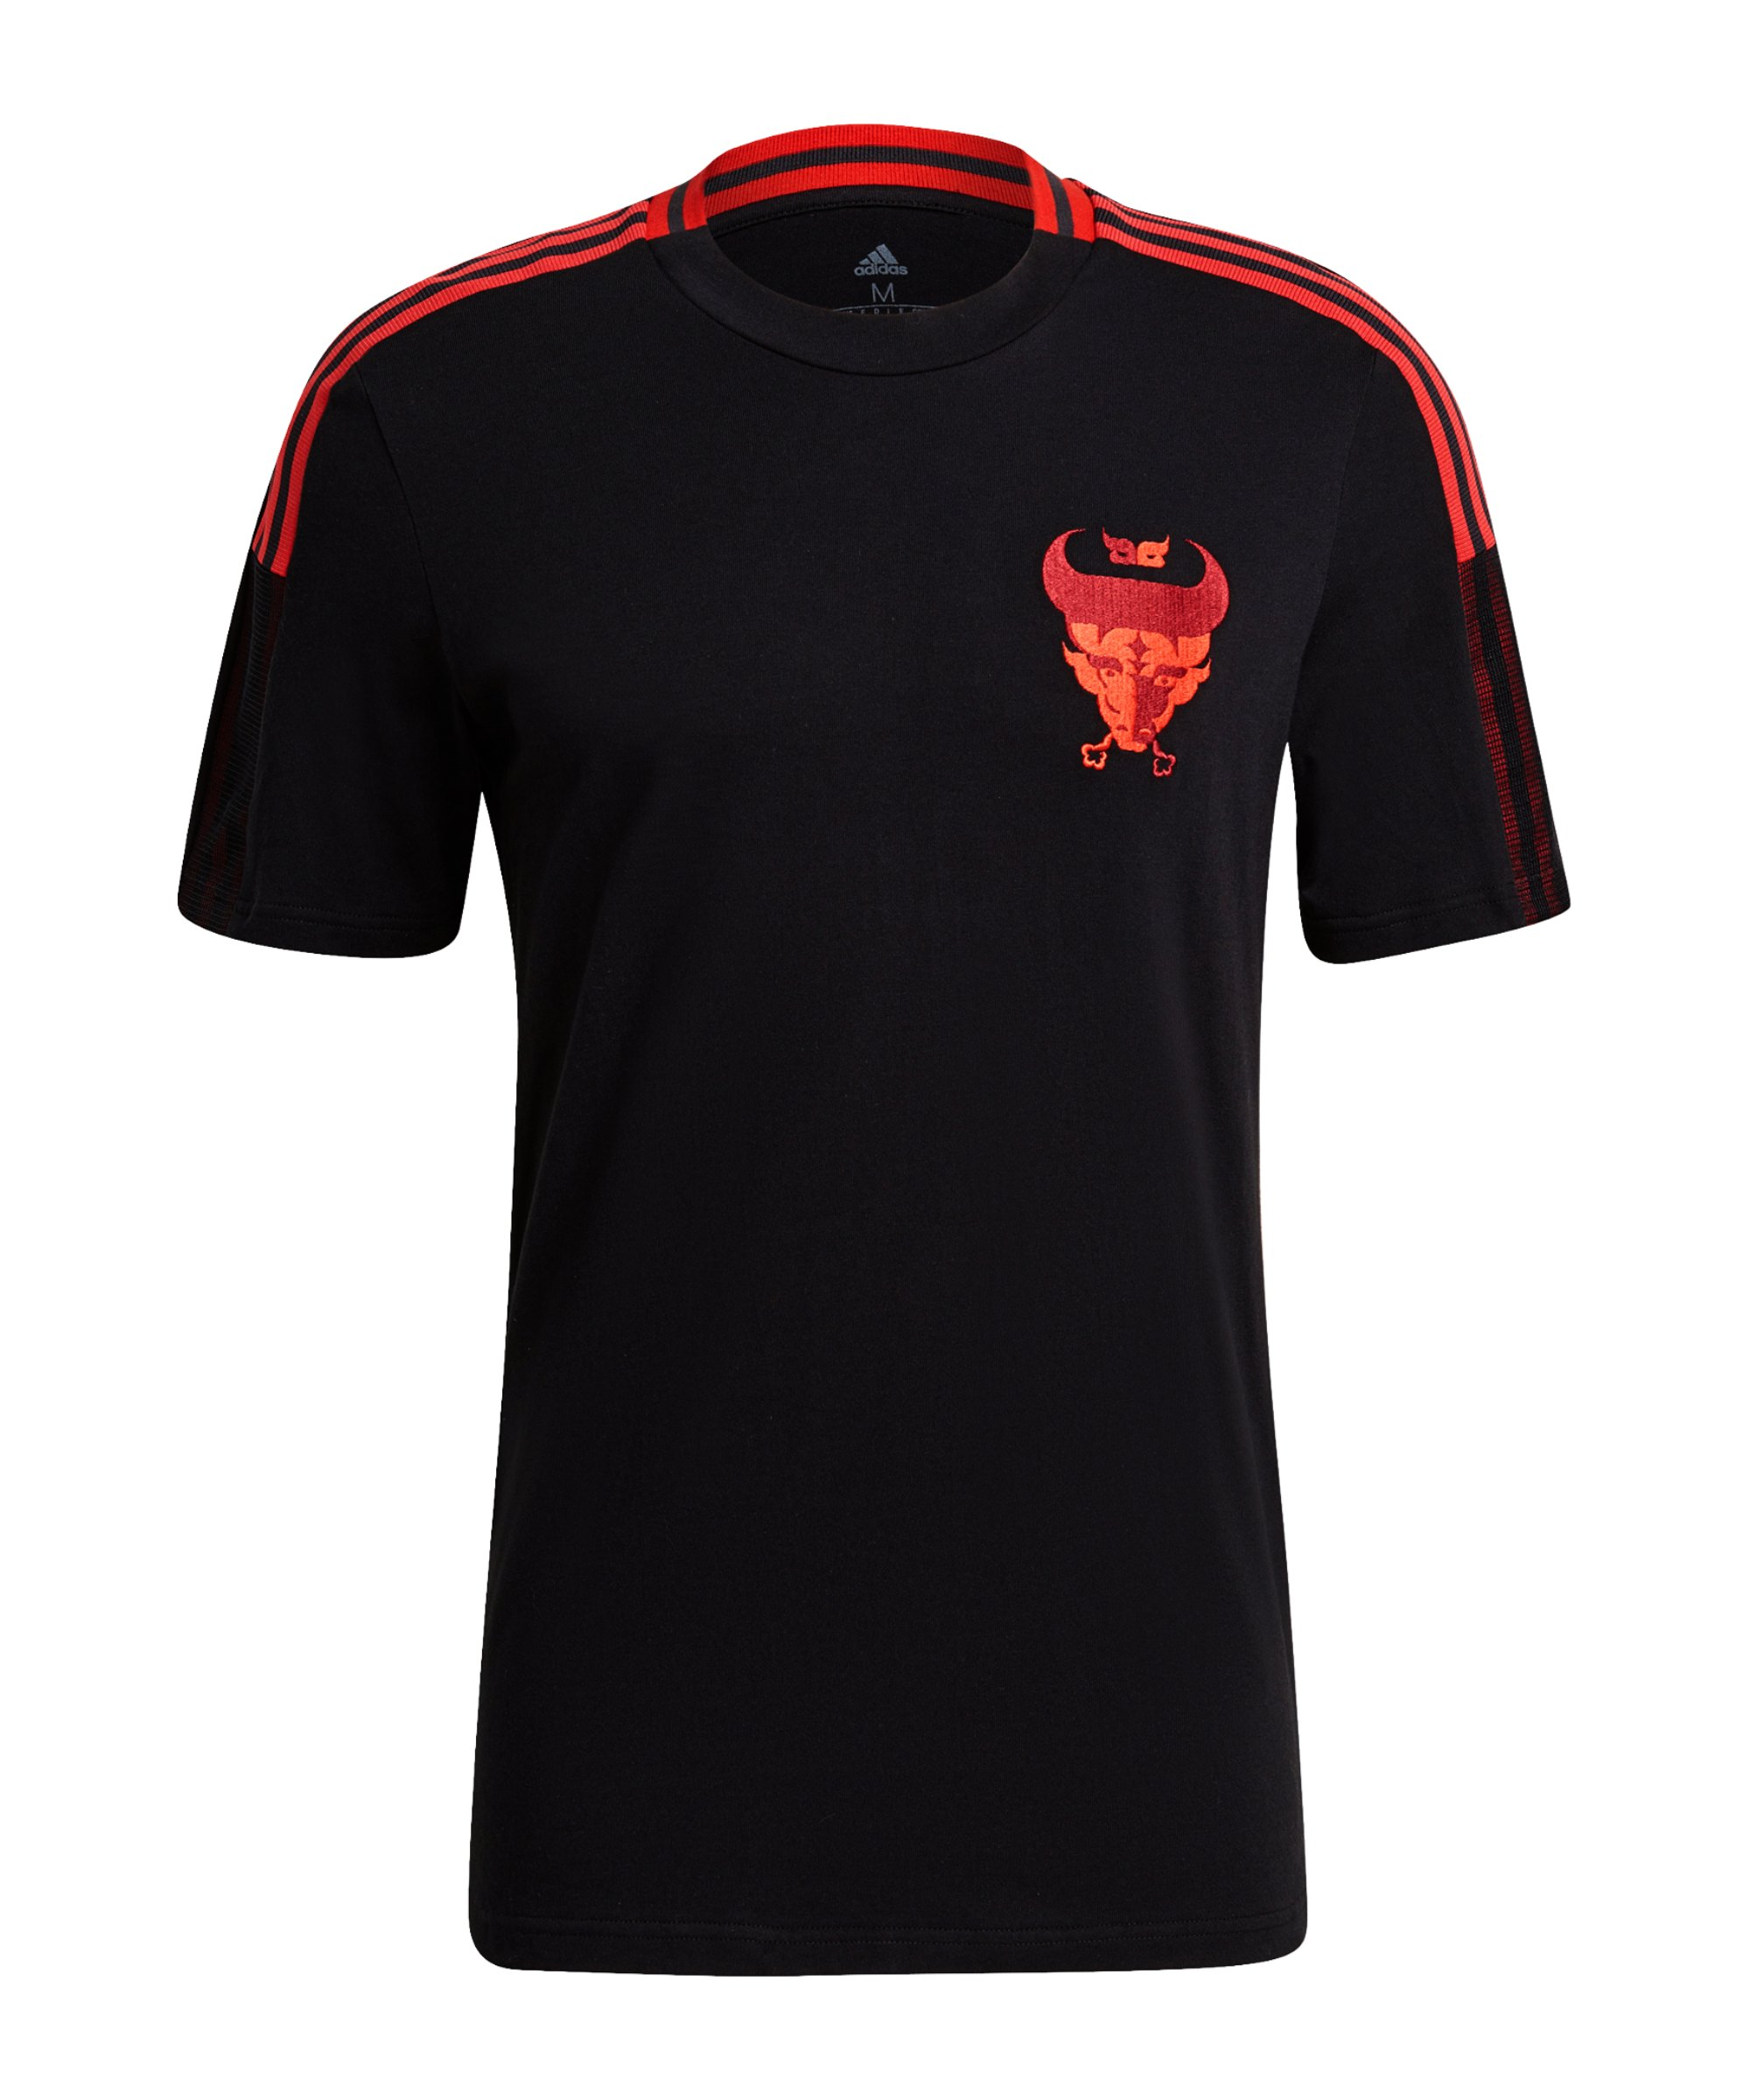 adidas FC Bayern München CNY T-Shirt Schwarz - schwarz